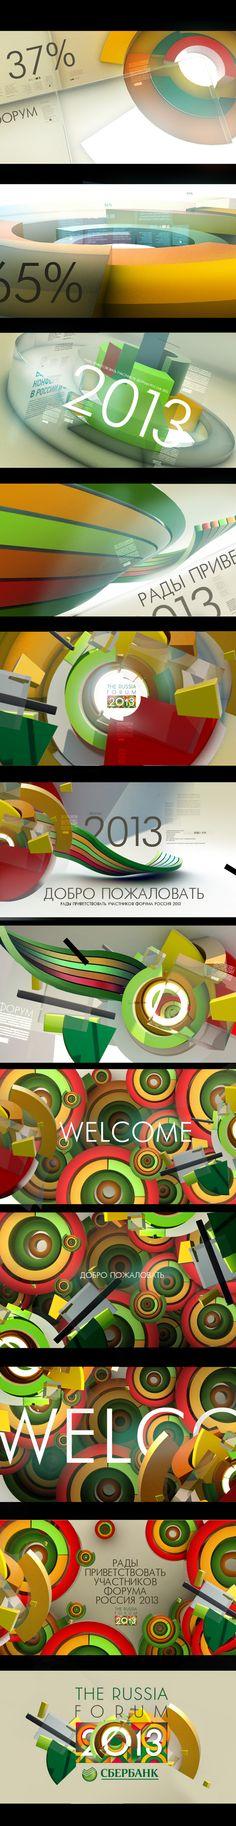 motion graphics/ storyboards/ styleframes | SBER_FORUM_2013 by Egor Antonov